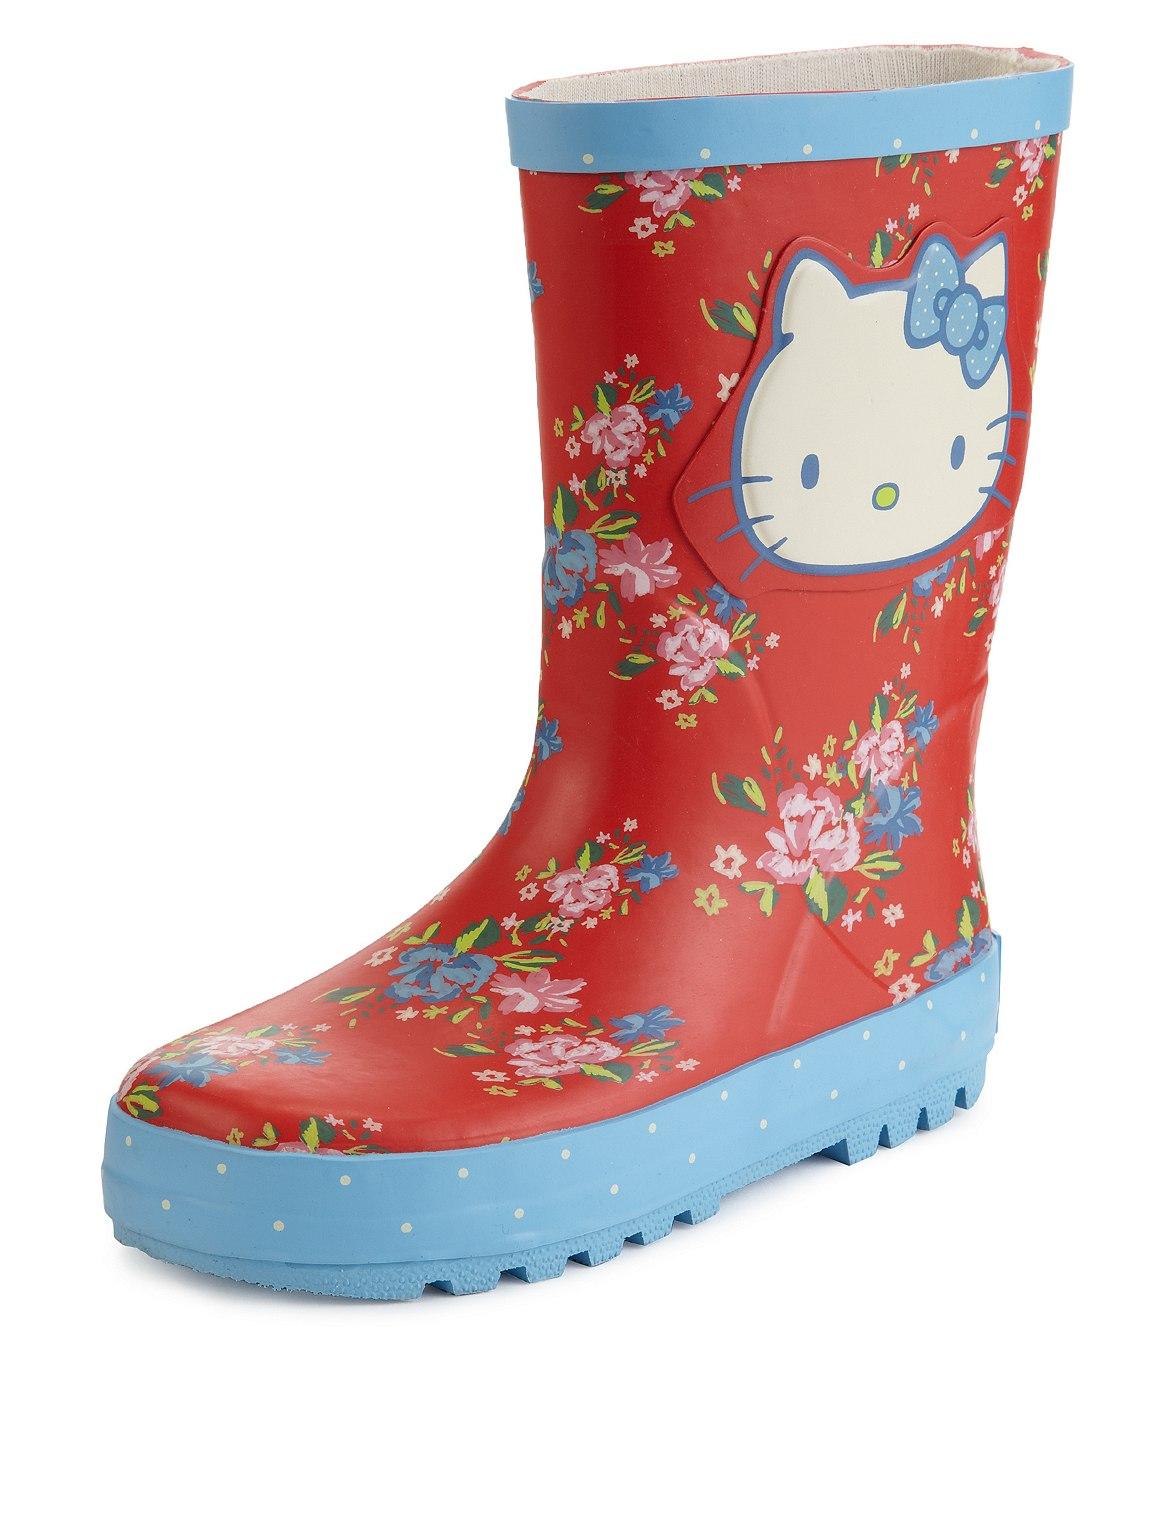 Hello Kitty regenlaarzen €8,95-€9,95 @ MarksandSpencer